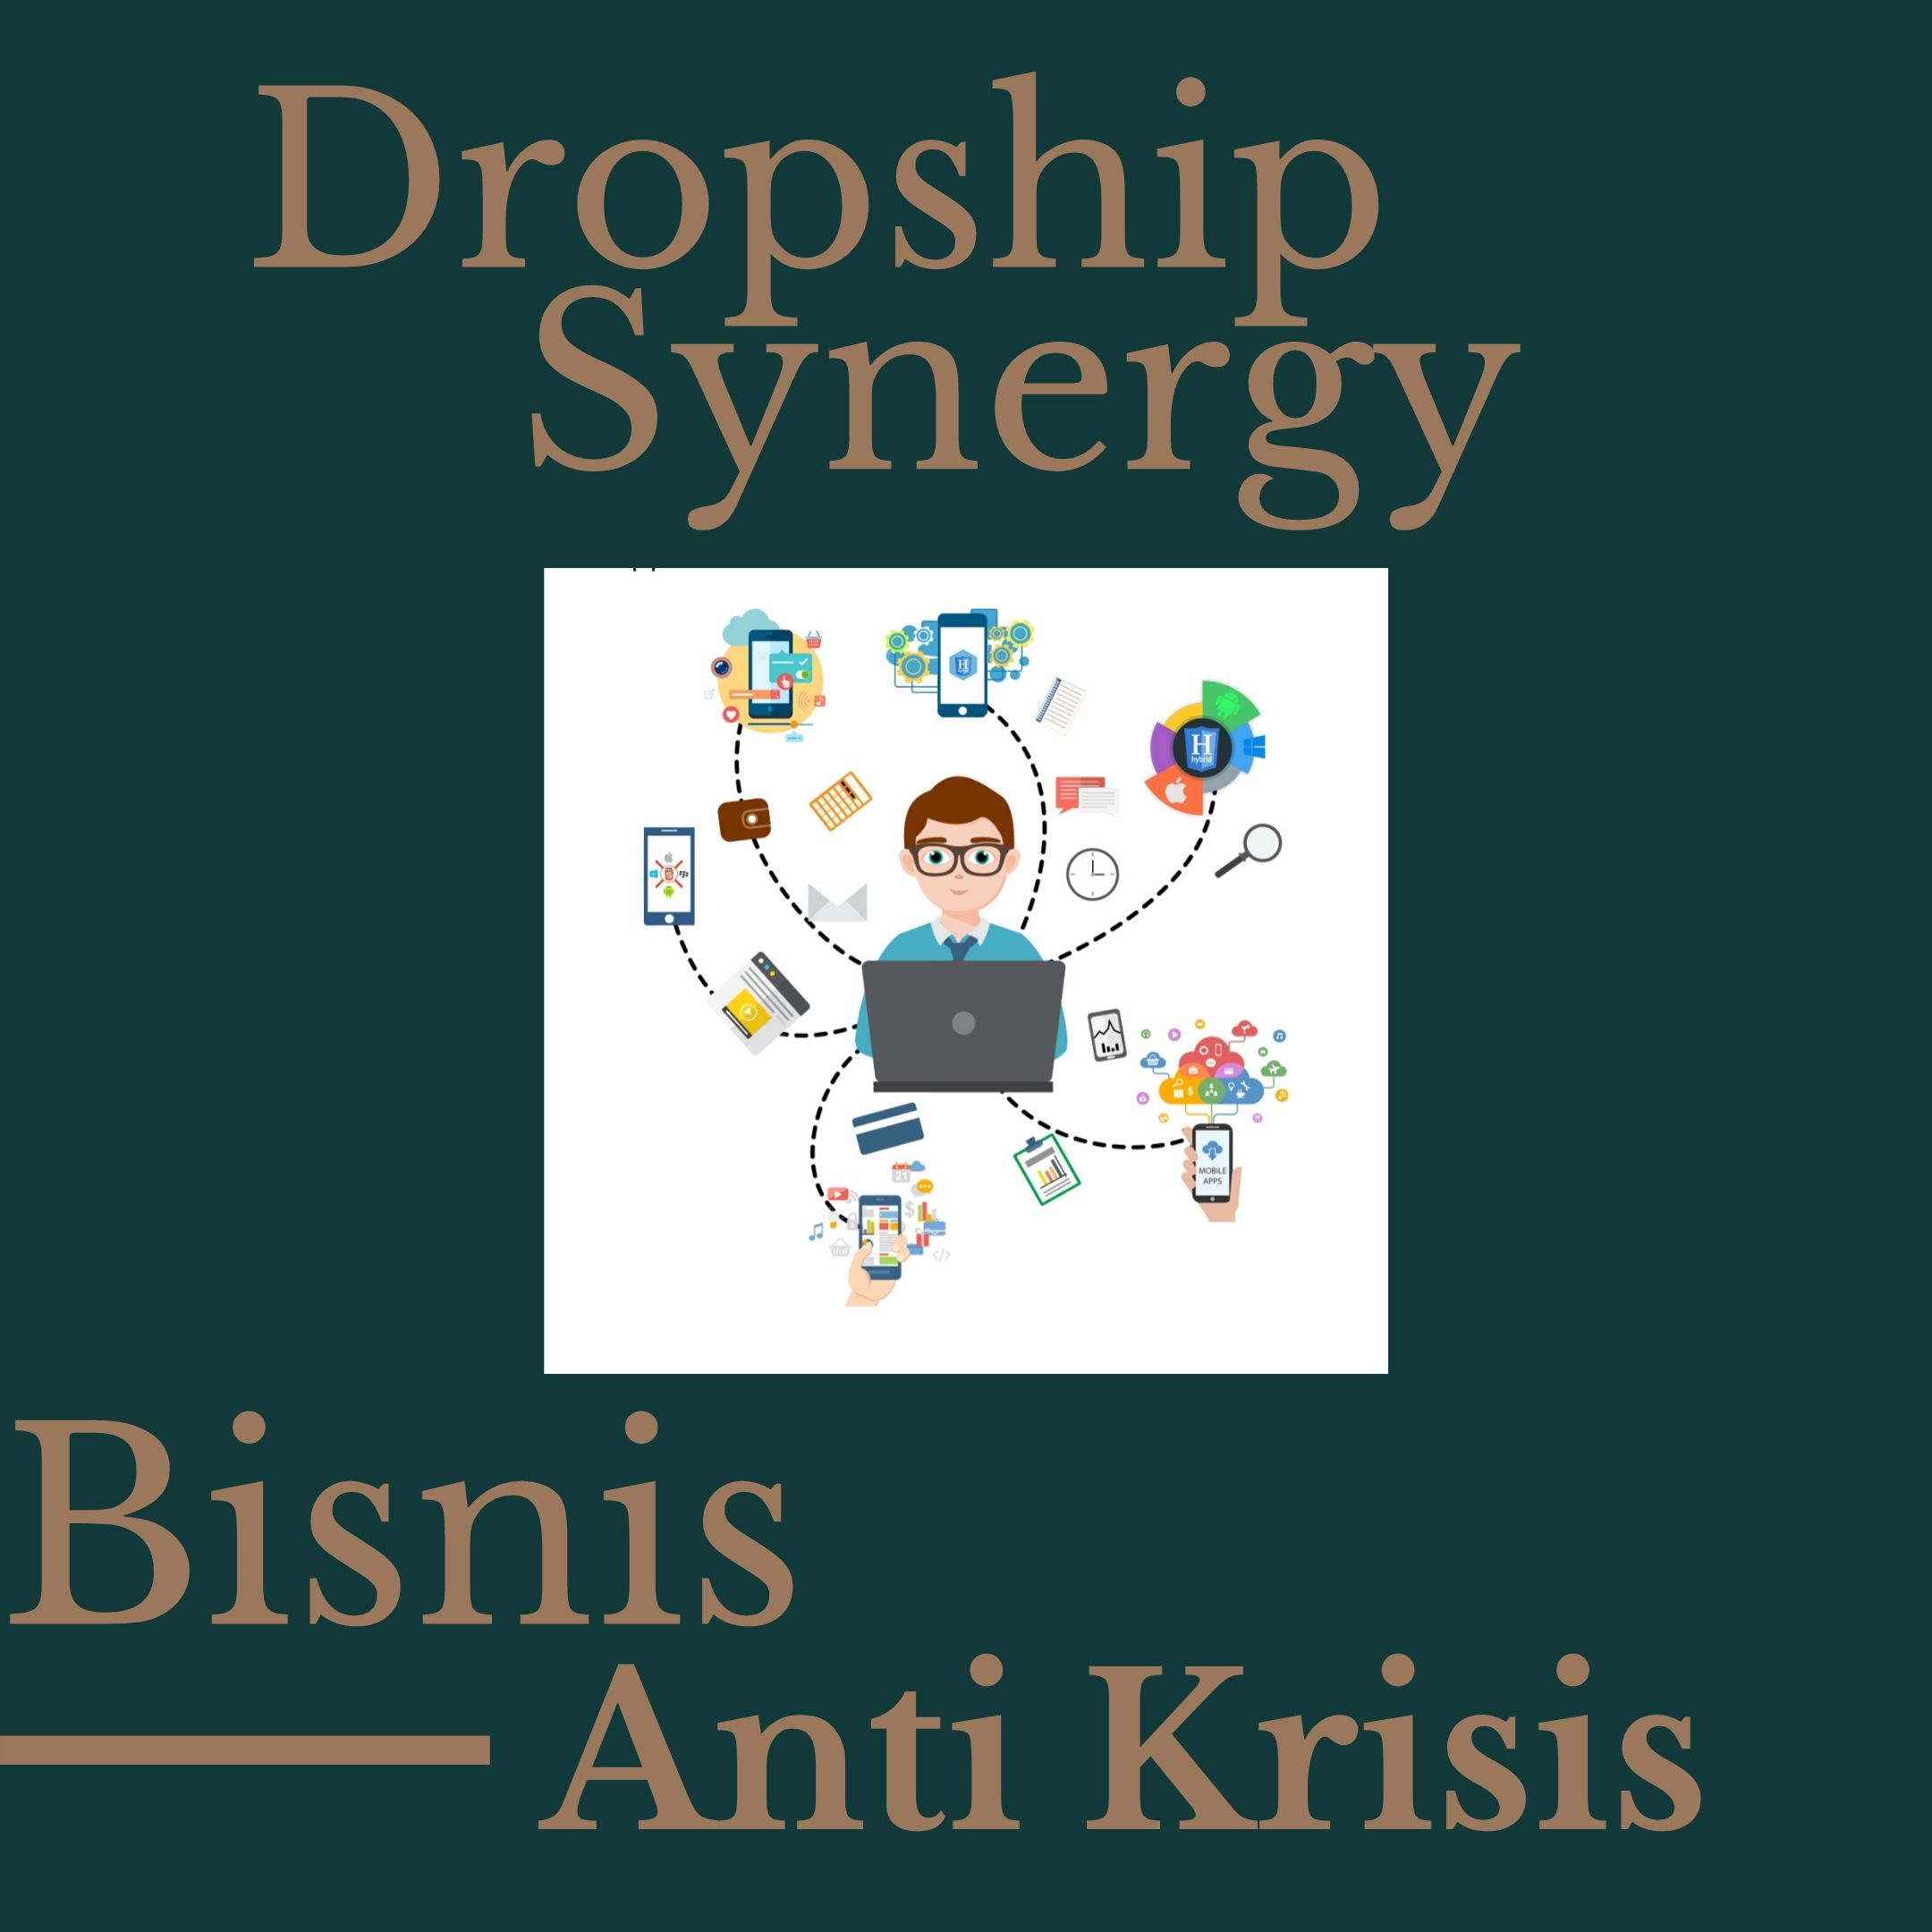 Bisnis Dropship Synergy Anti Krisis